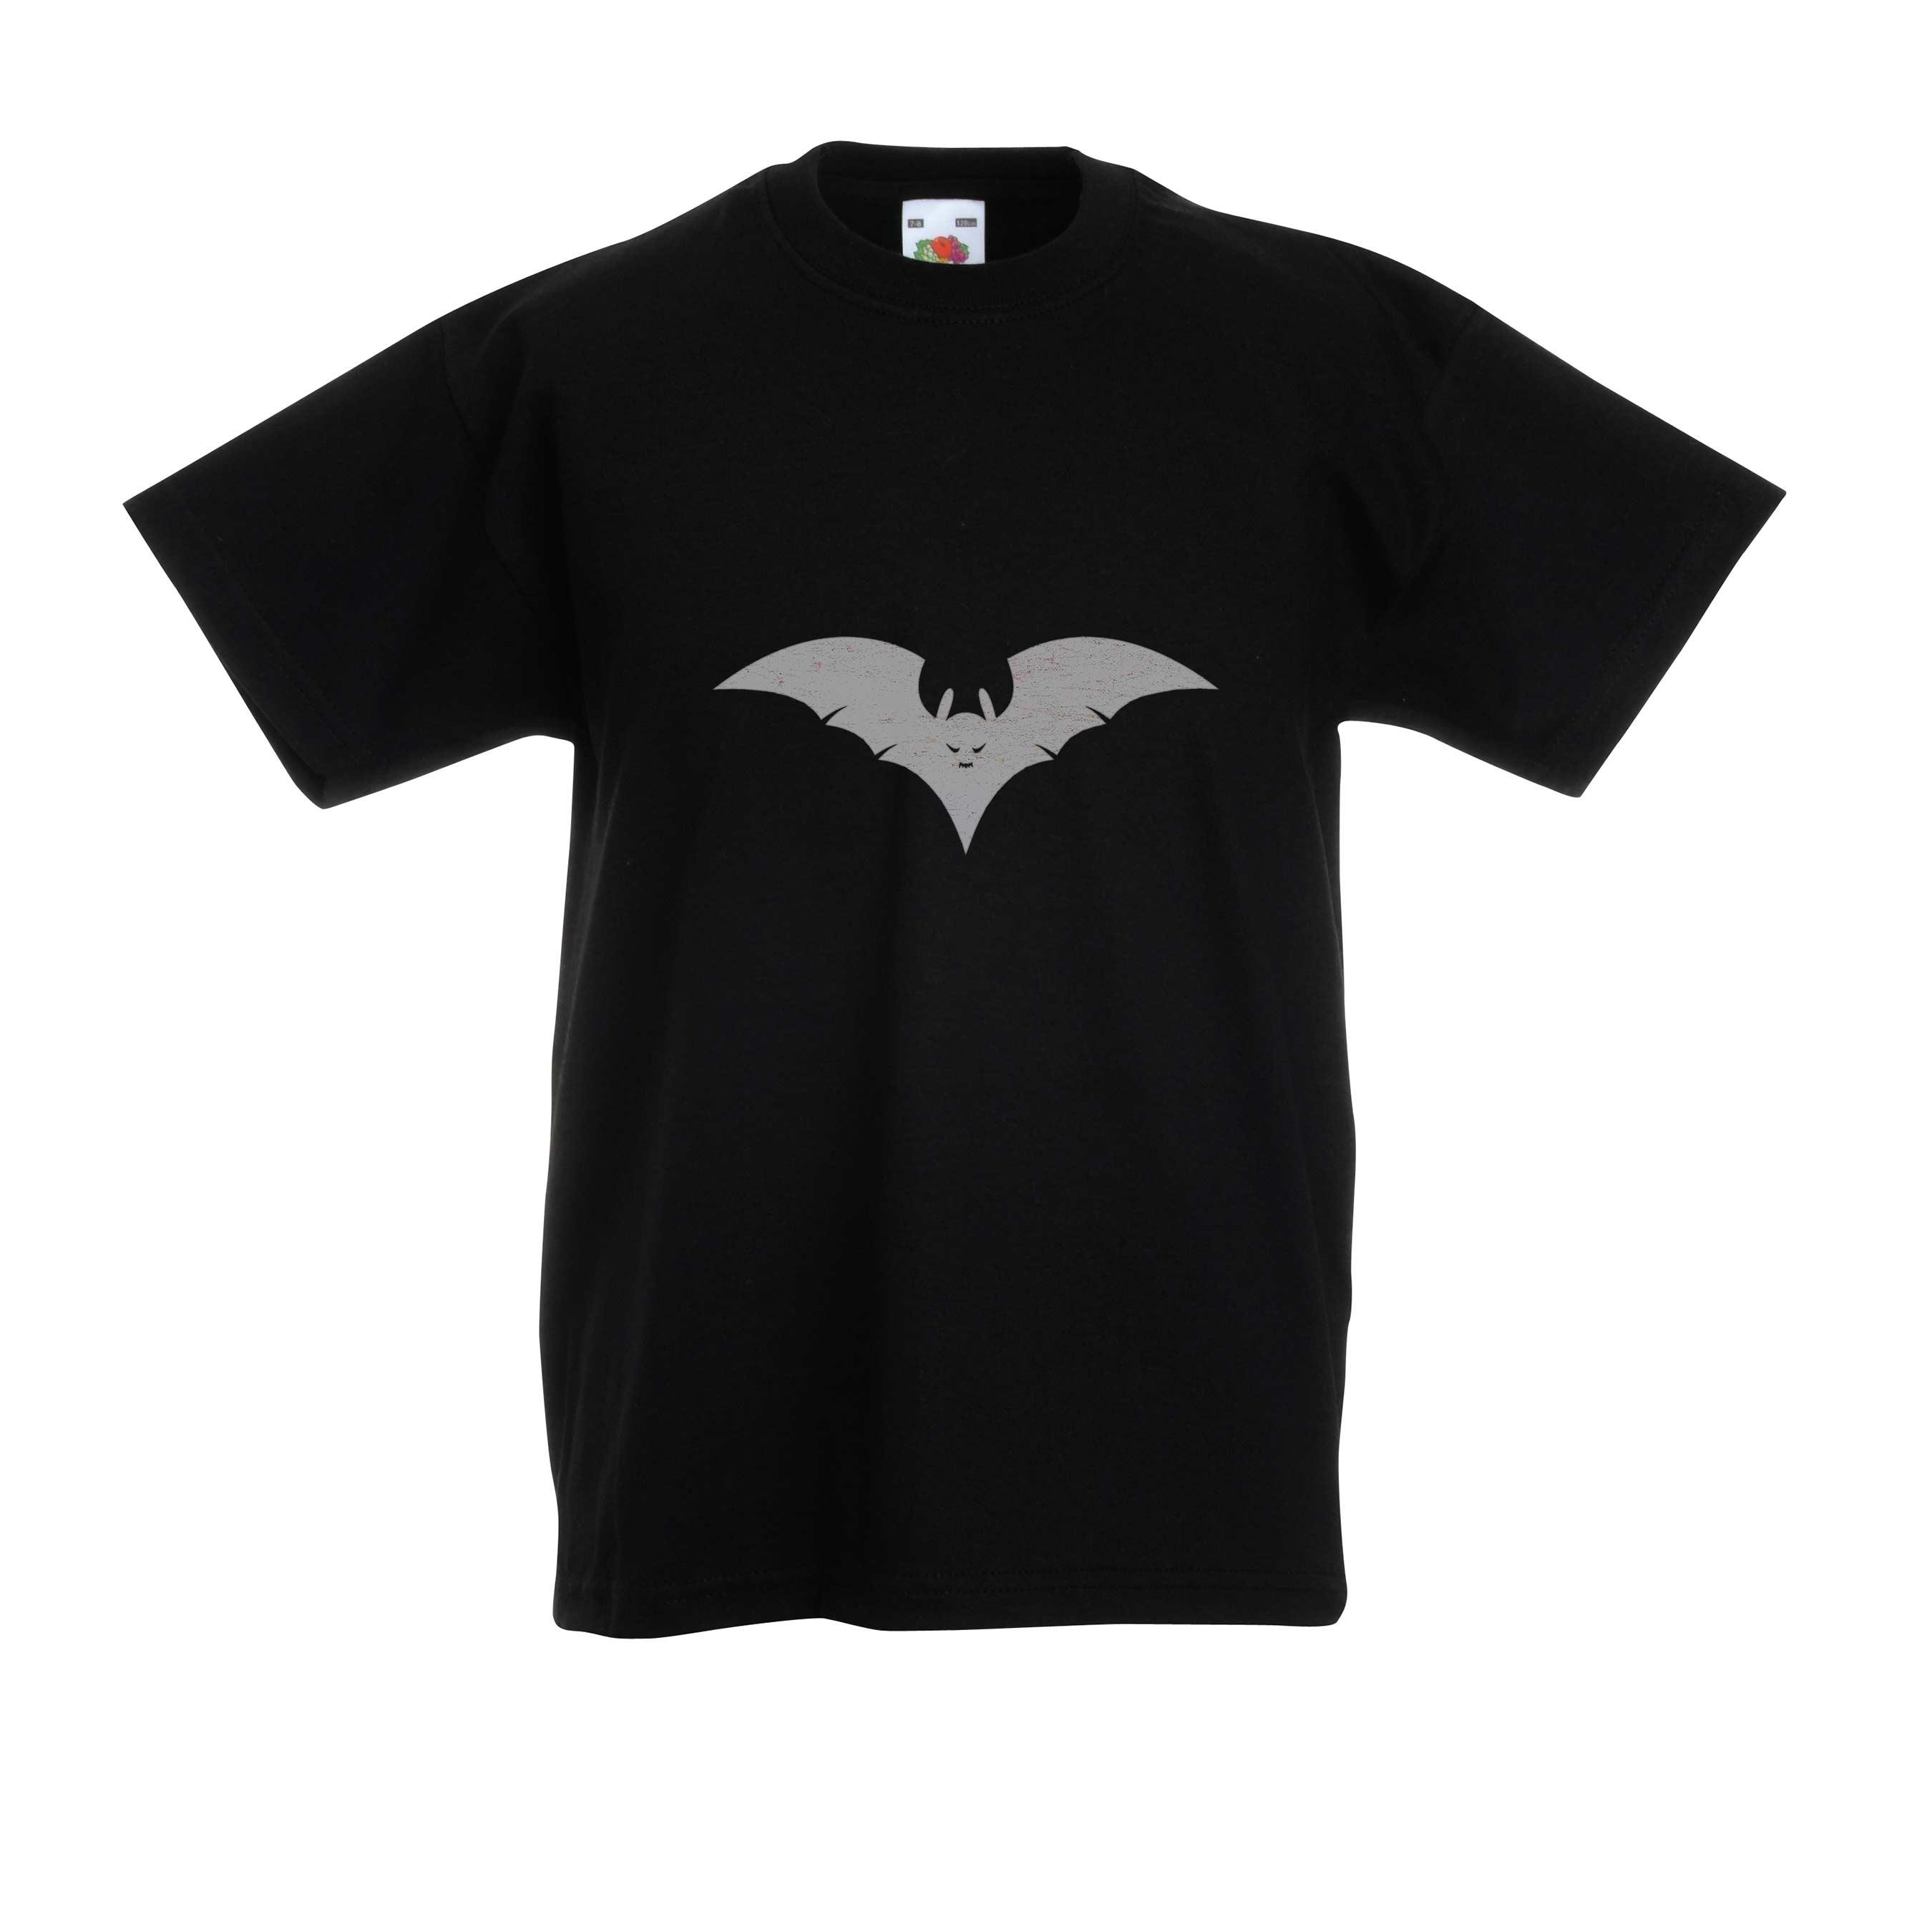 Bat design for t-shirt, hoodie & sweatshirt